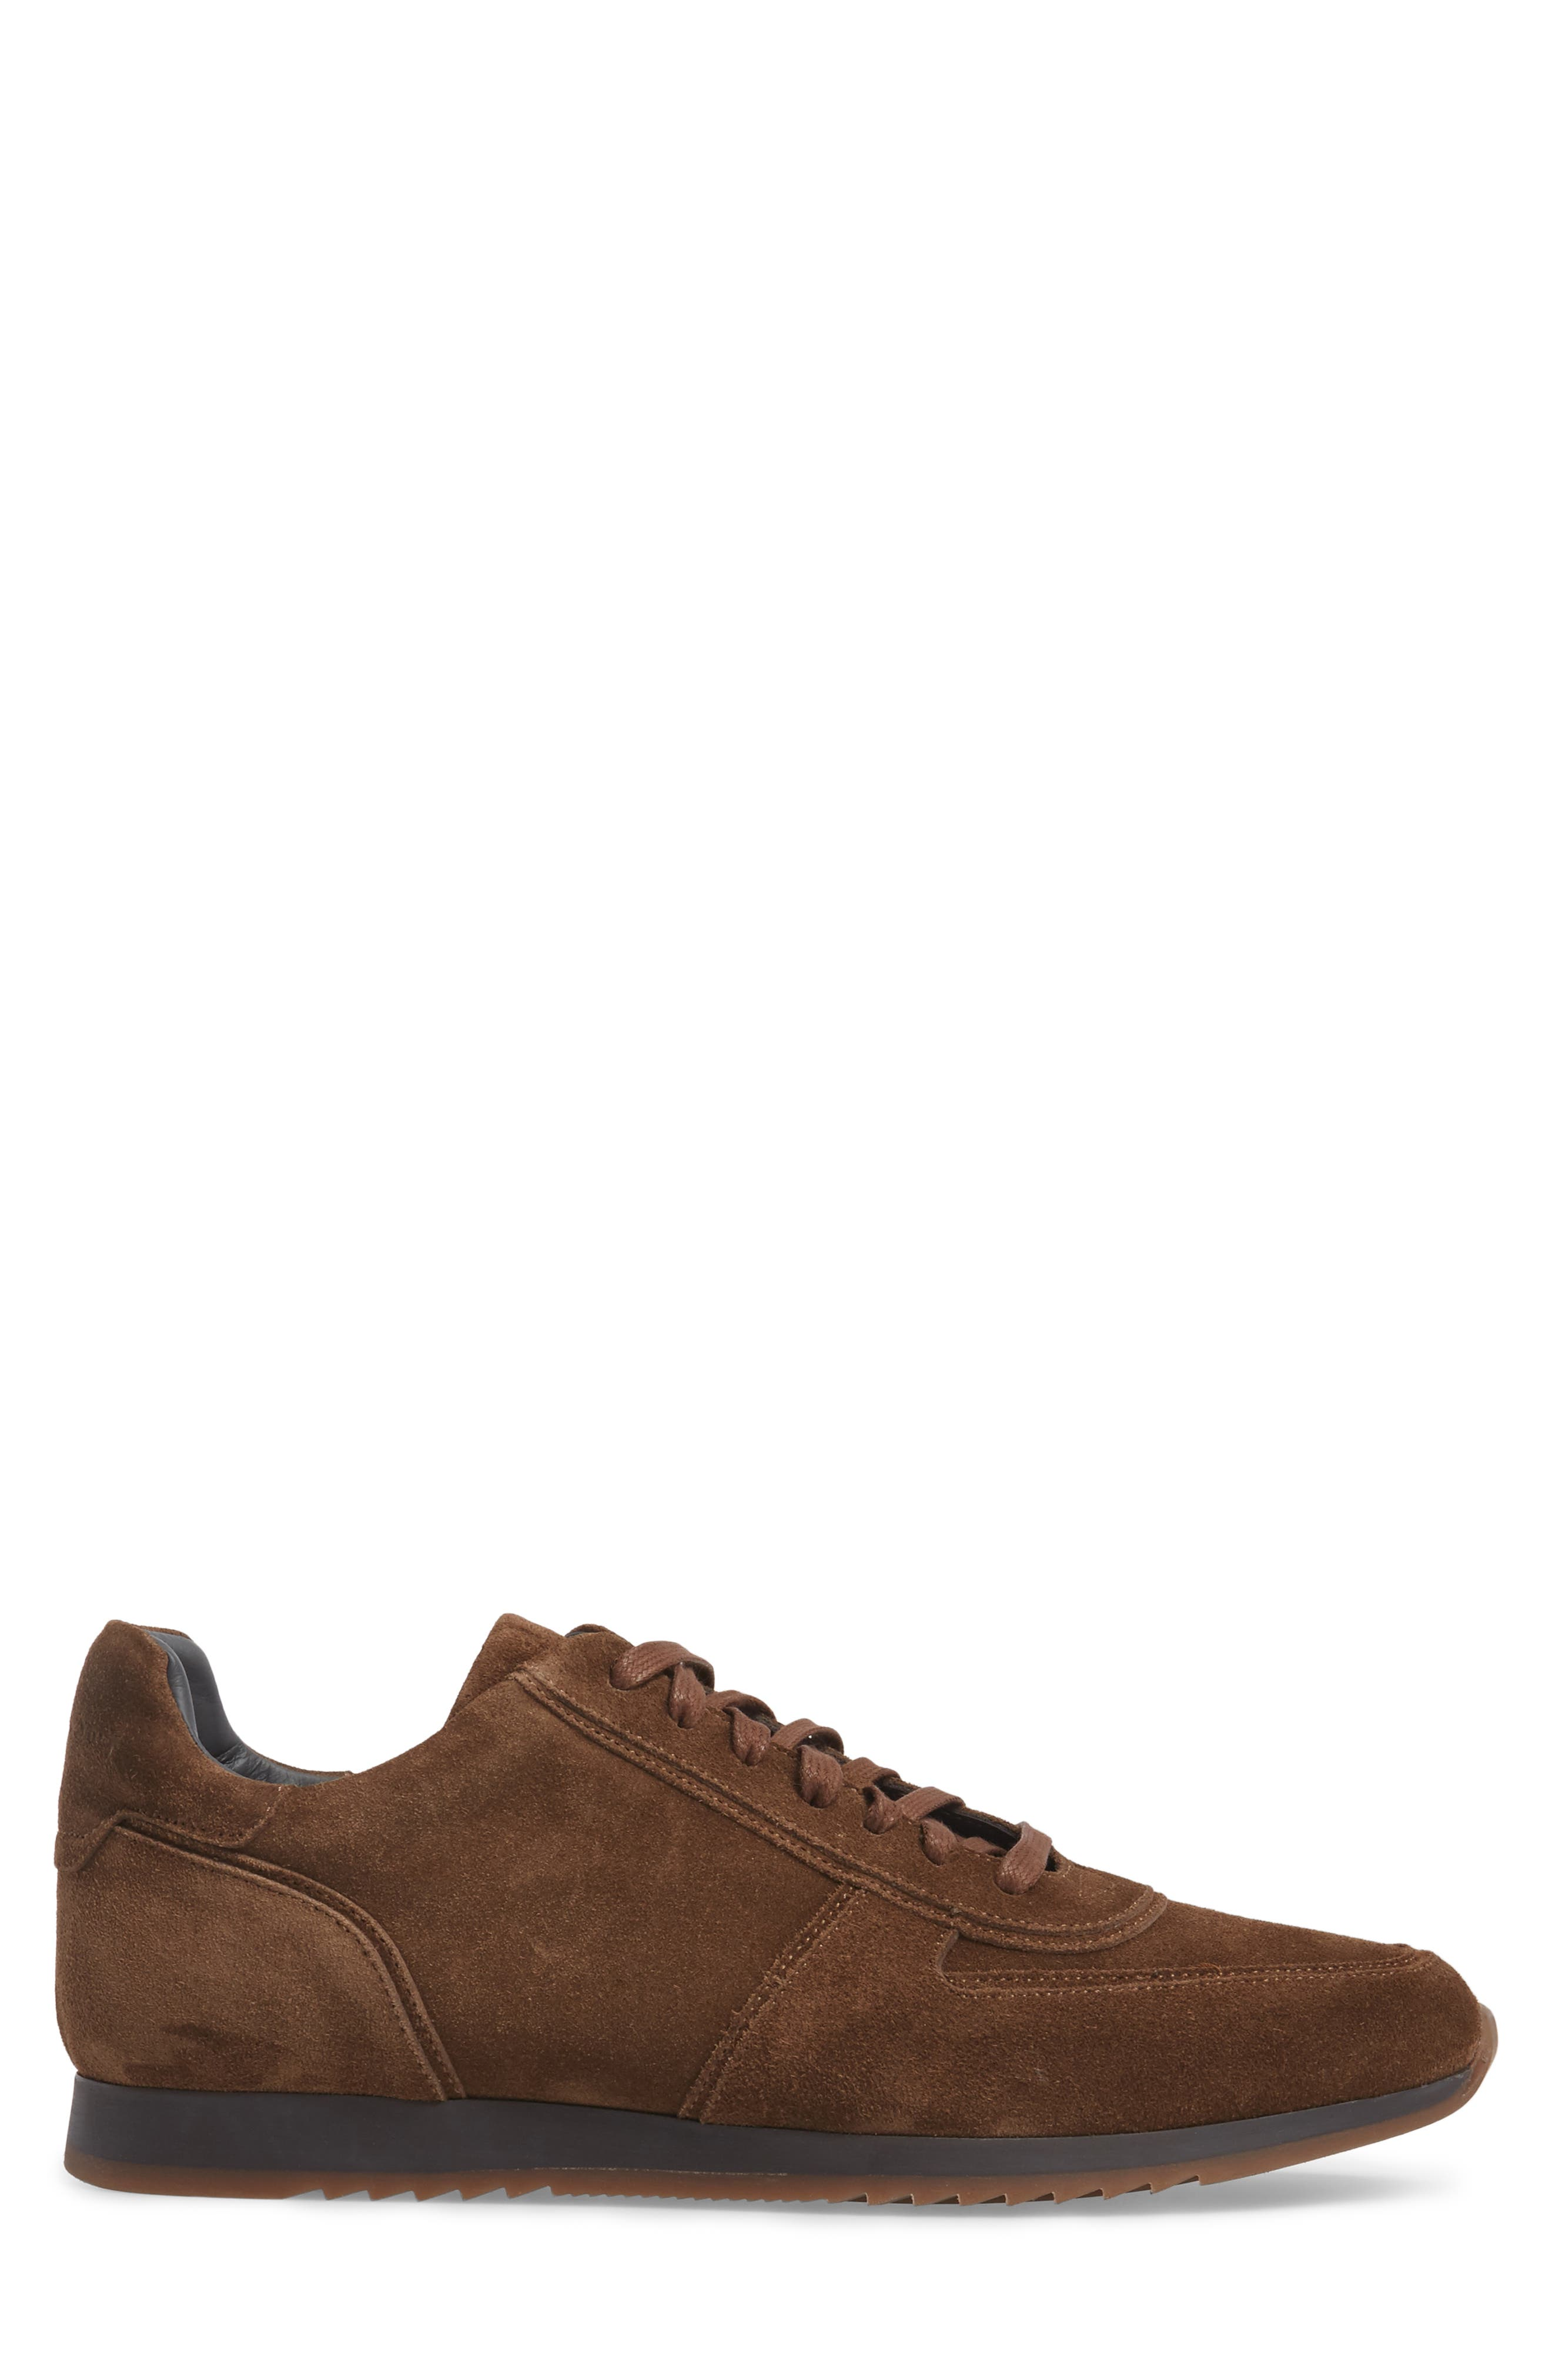 Hatton Sneaker,                             Alternate thumbnail 3, color,                             Softy Marrone